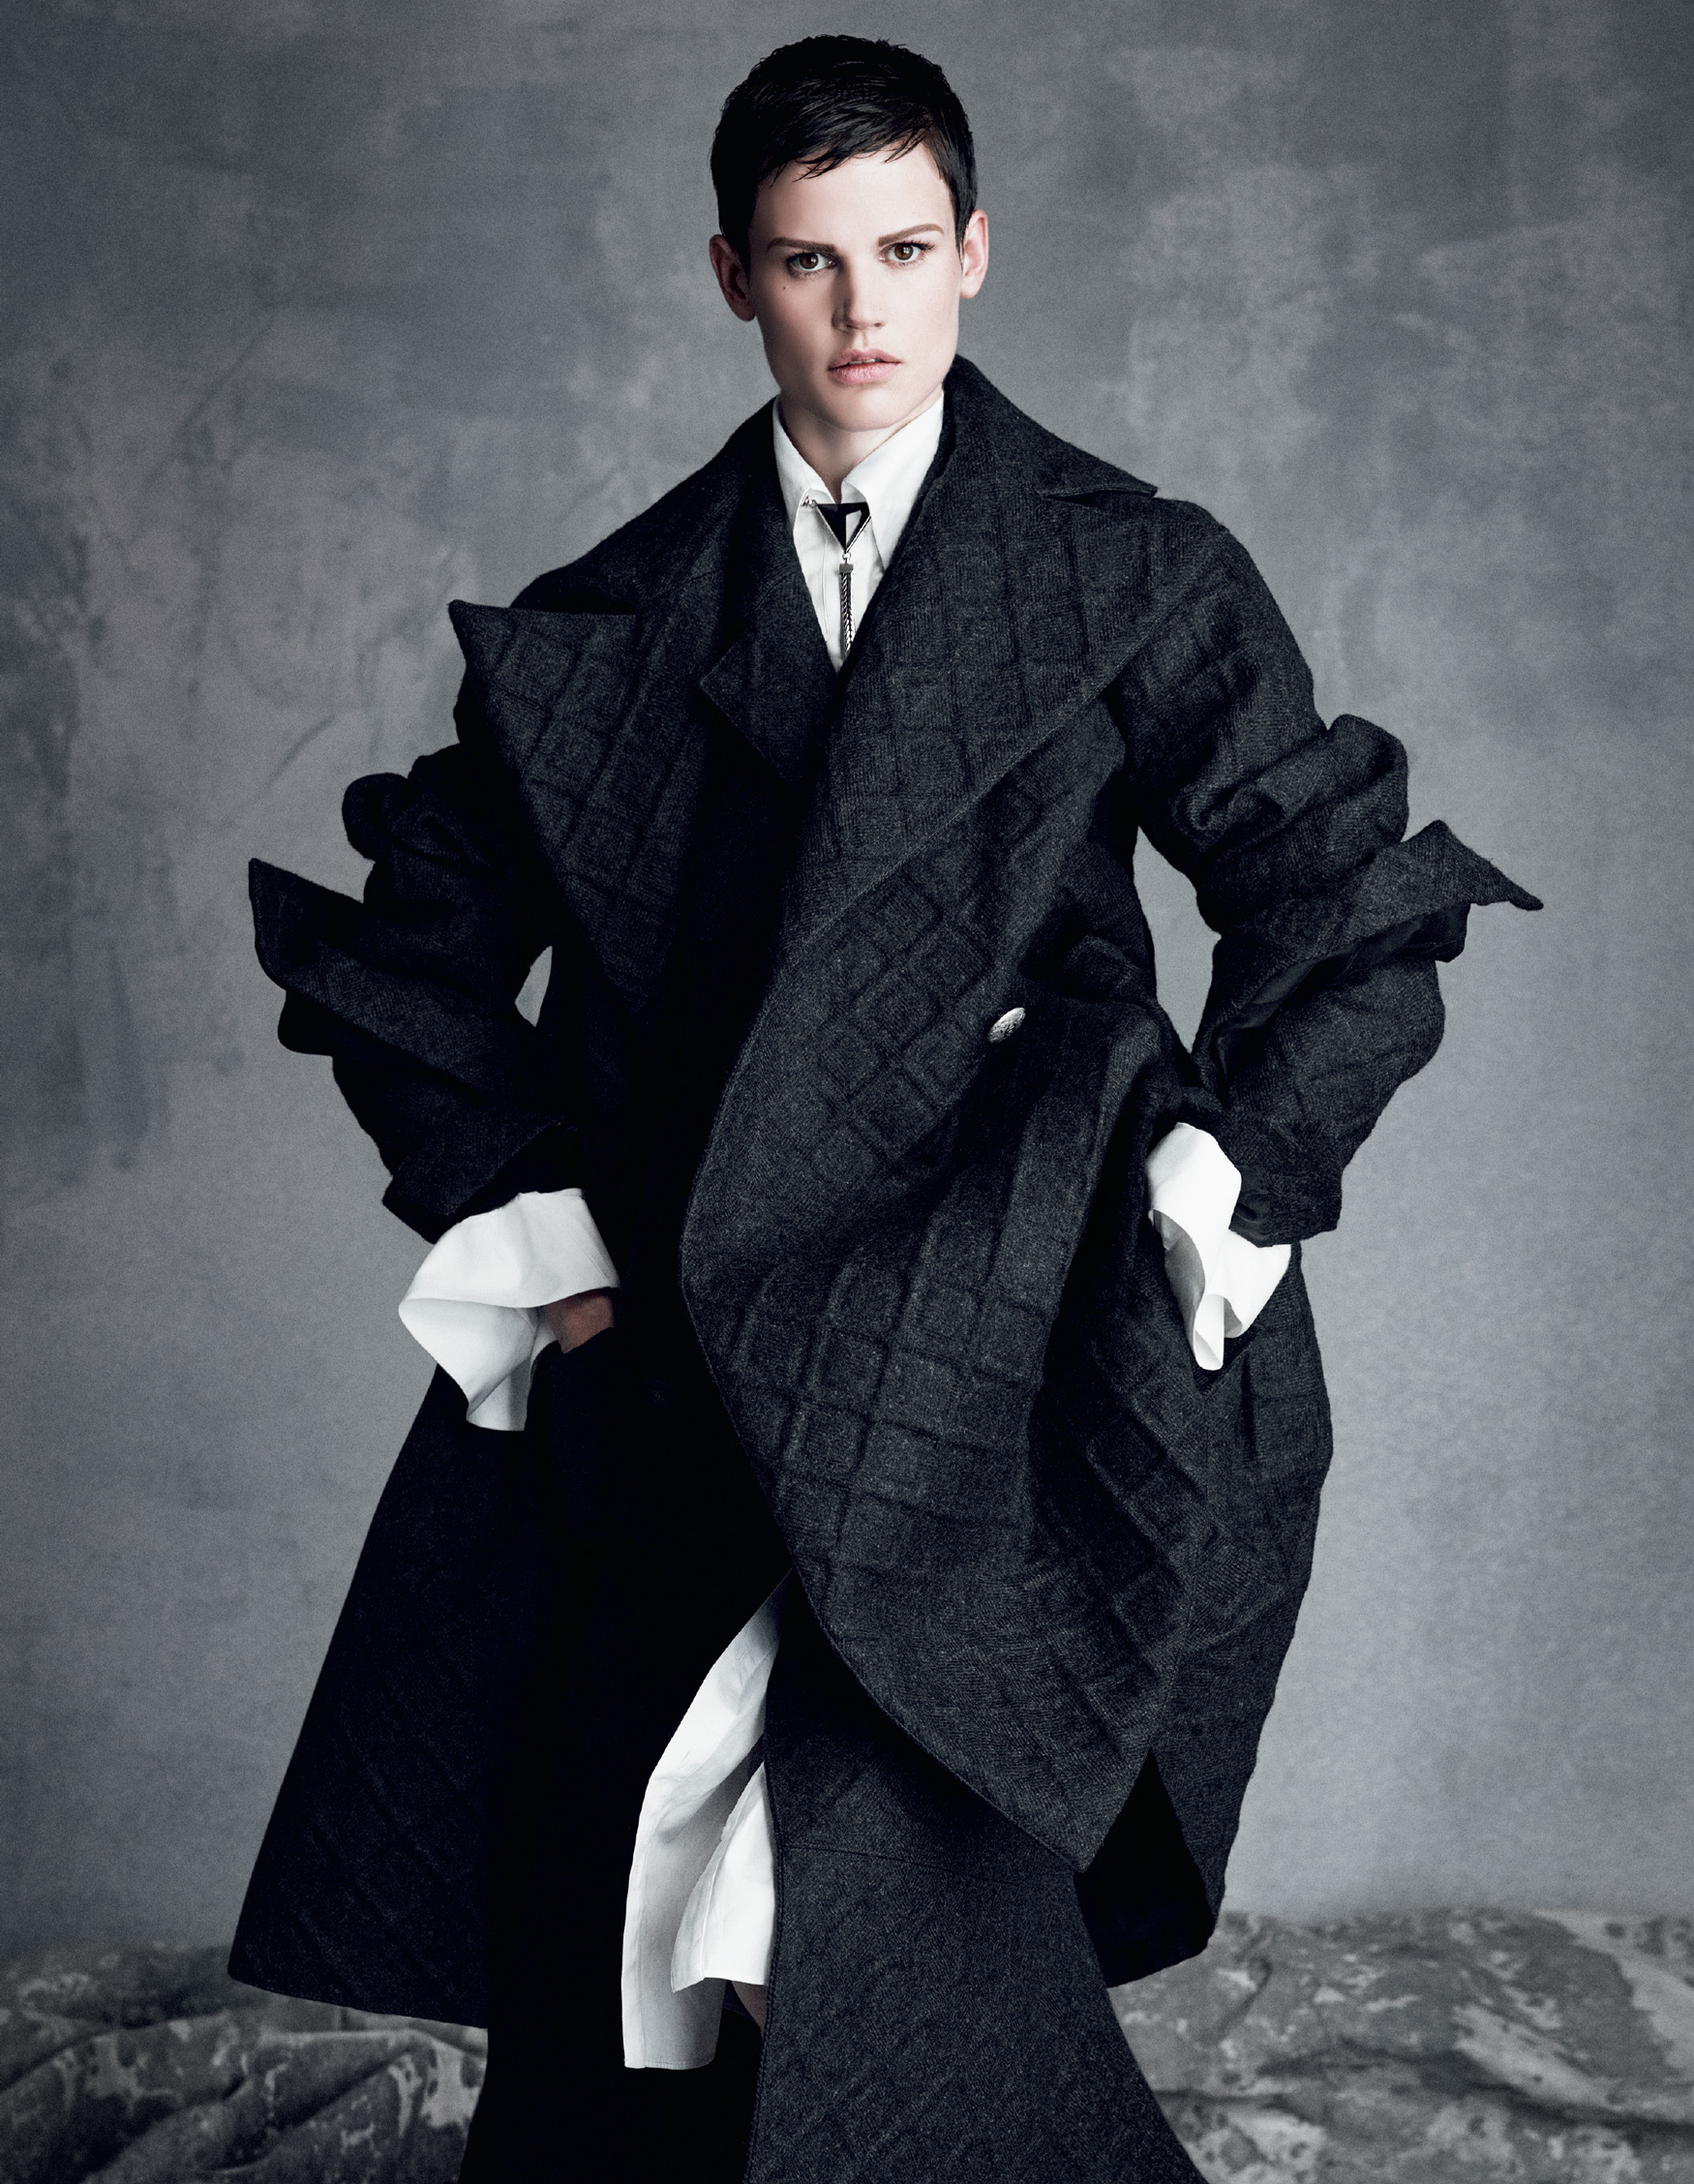 Giovanna-Battaglia-The-Icons-Of-Perfections-Vogue-Japan-15th-Anniversary-Issue-Luigi-Iango-V181_251_200-17.jpg